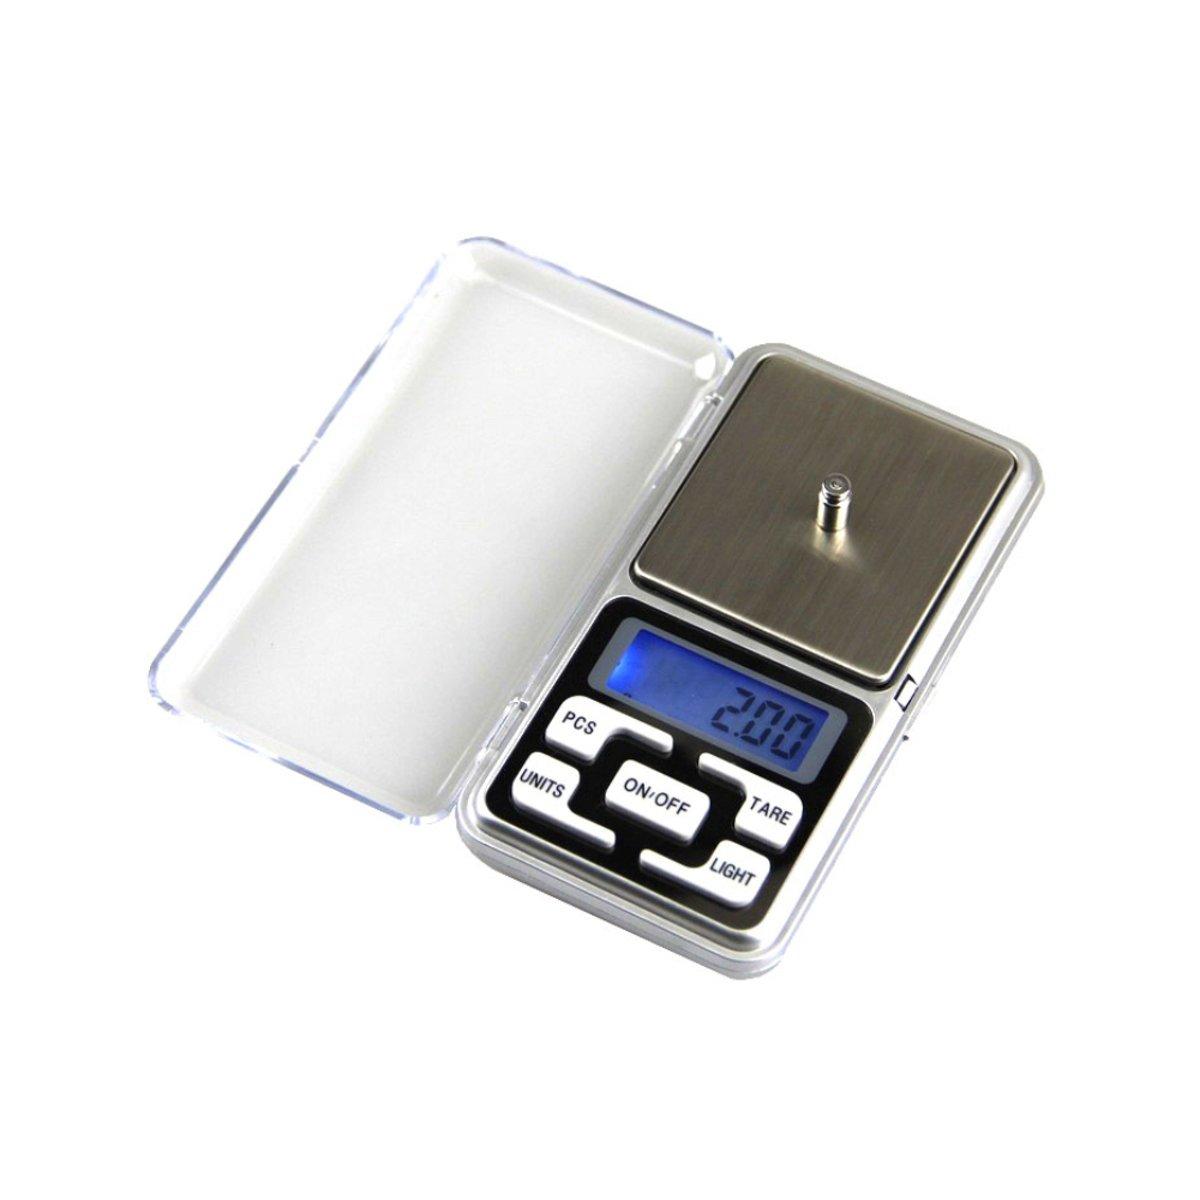 Mini precisie weegschaal 0.01 gram nauwkeurig tot 200 gram